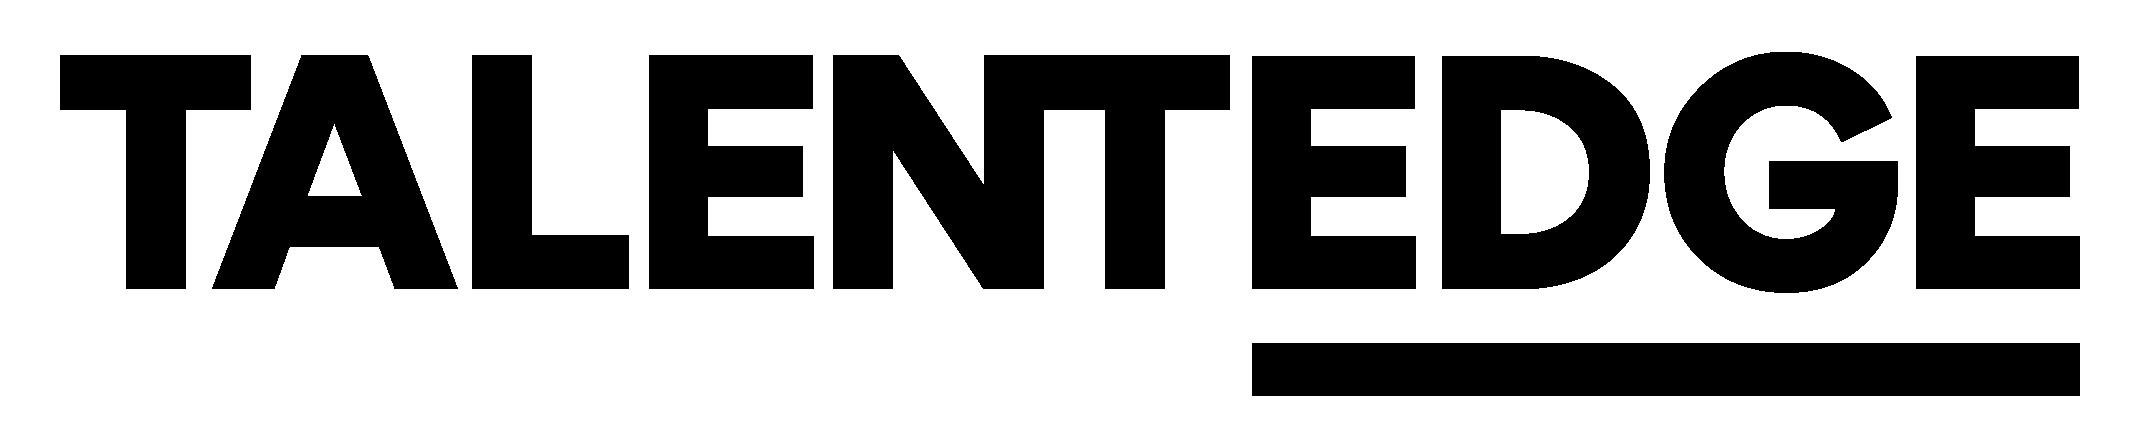 talentedge-logo